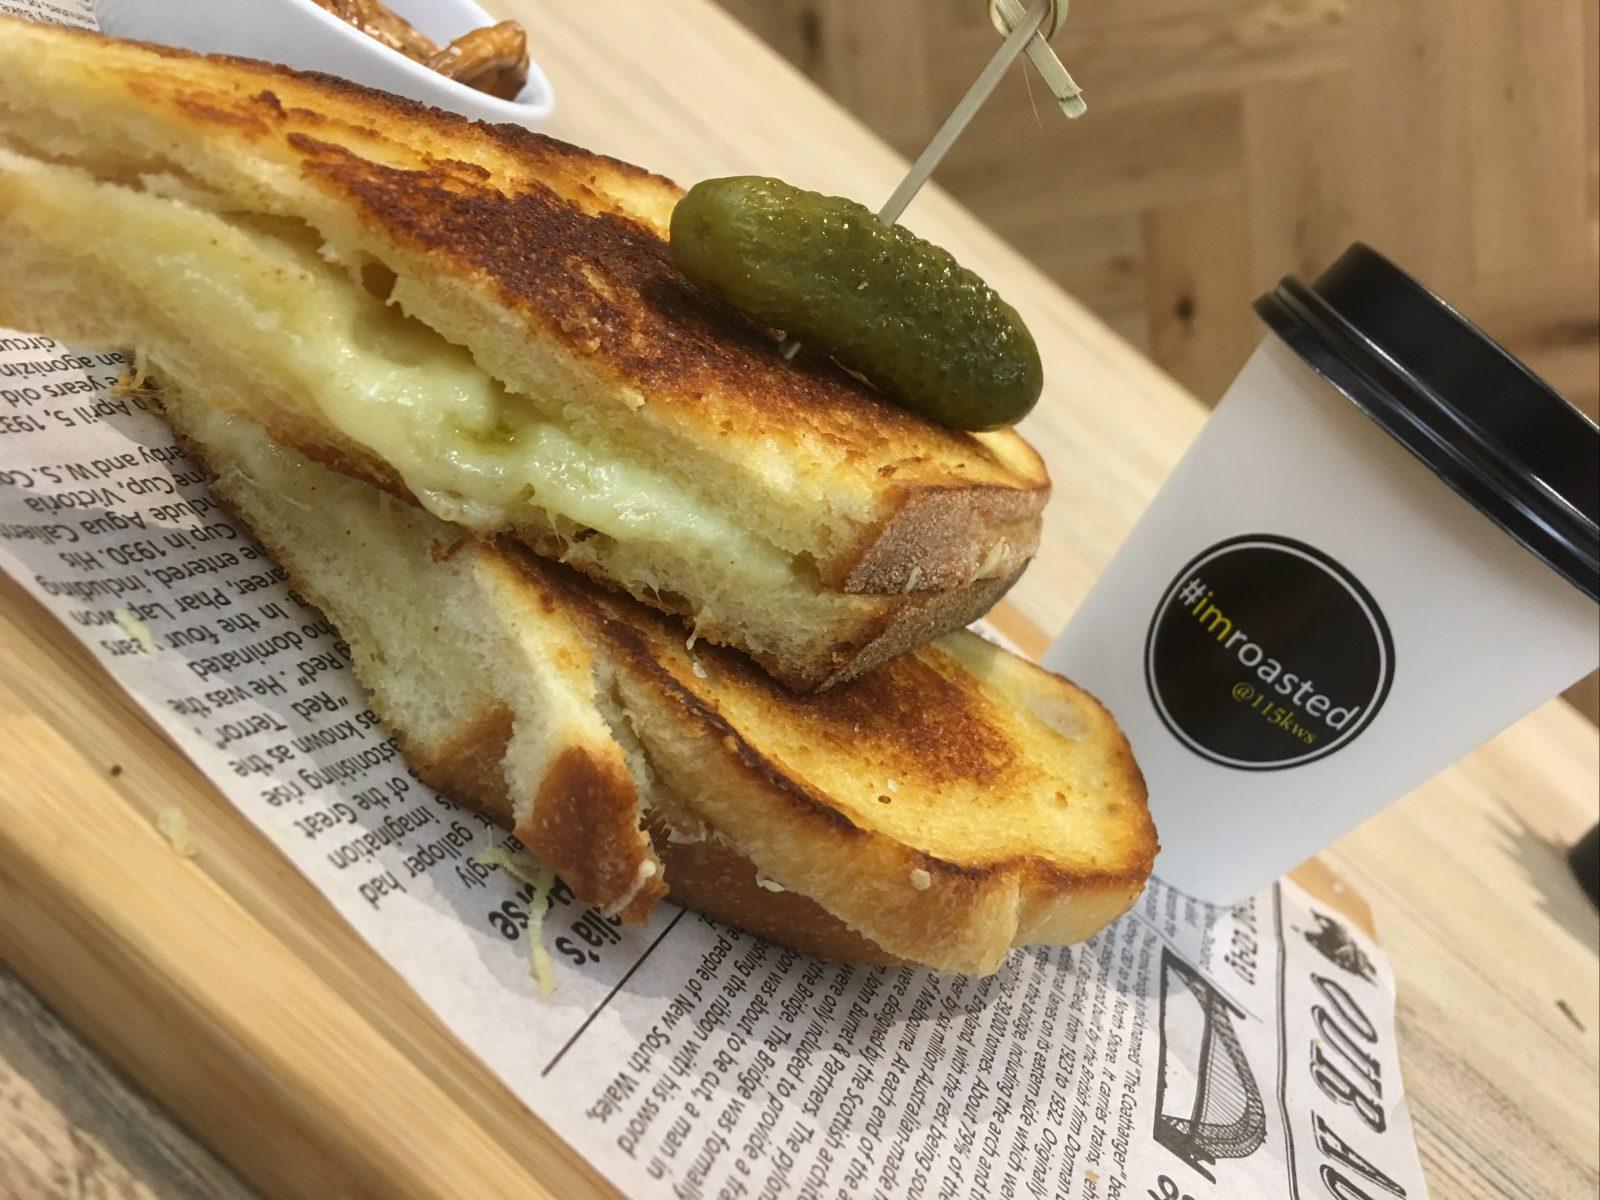 Cheese toastie arabica coffee take away fleurieu milk company